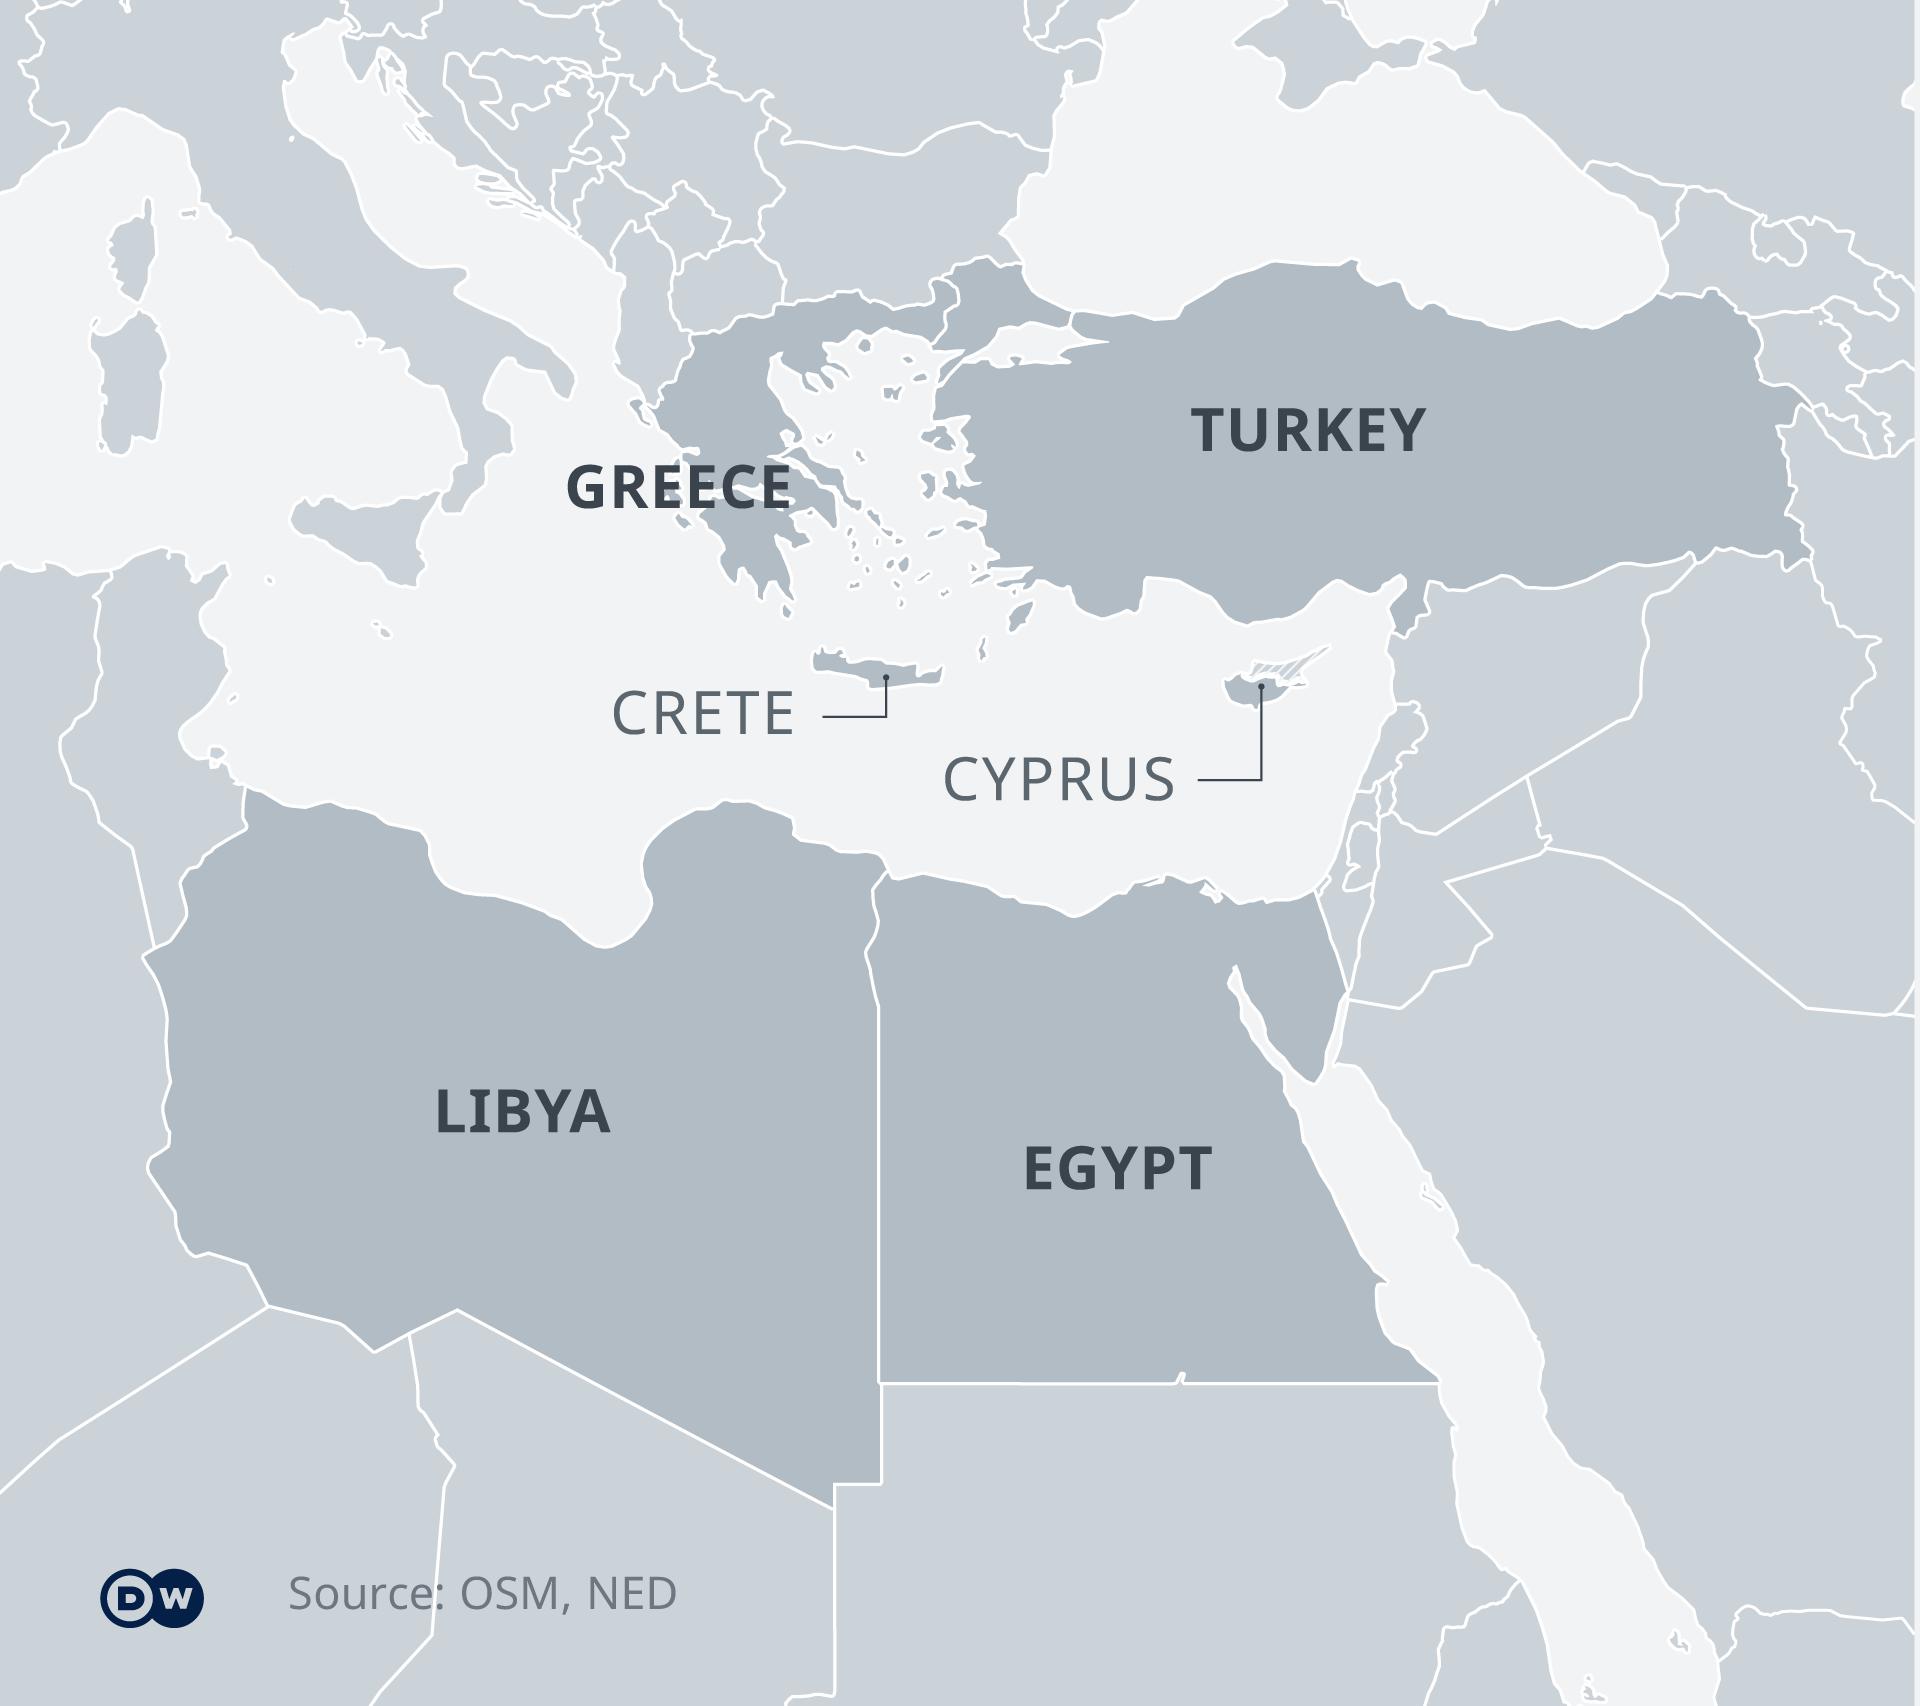 Turkey-Libya maritime deal triggers Mediterranean tensions ...